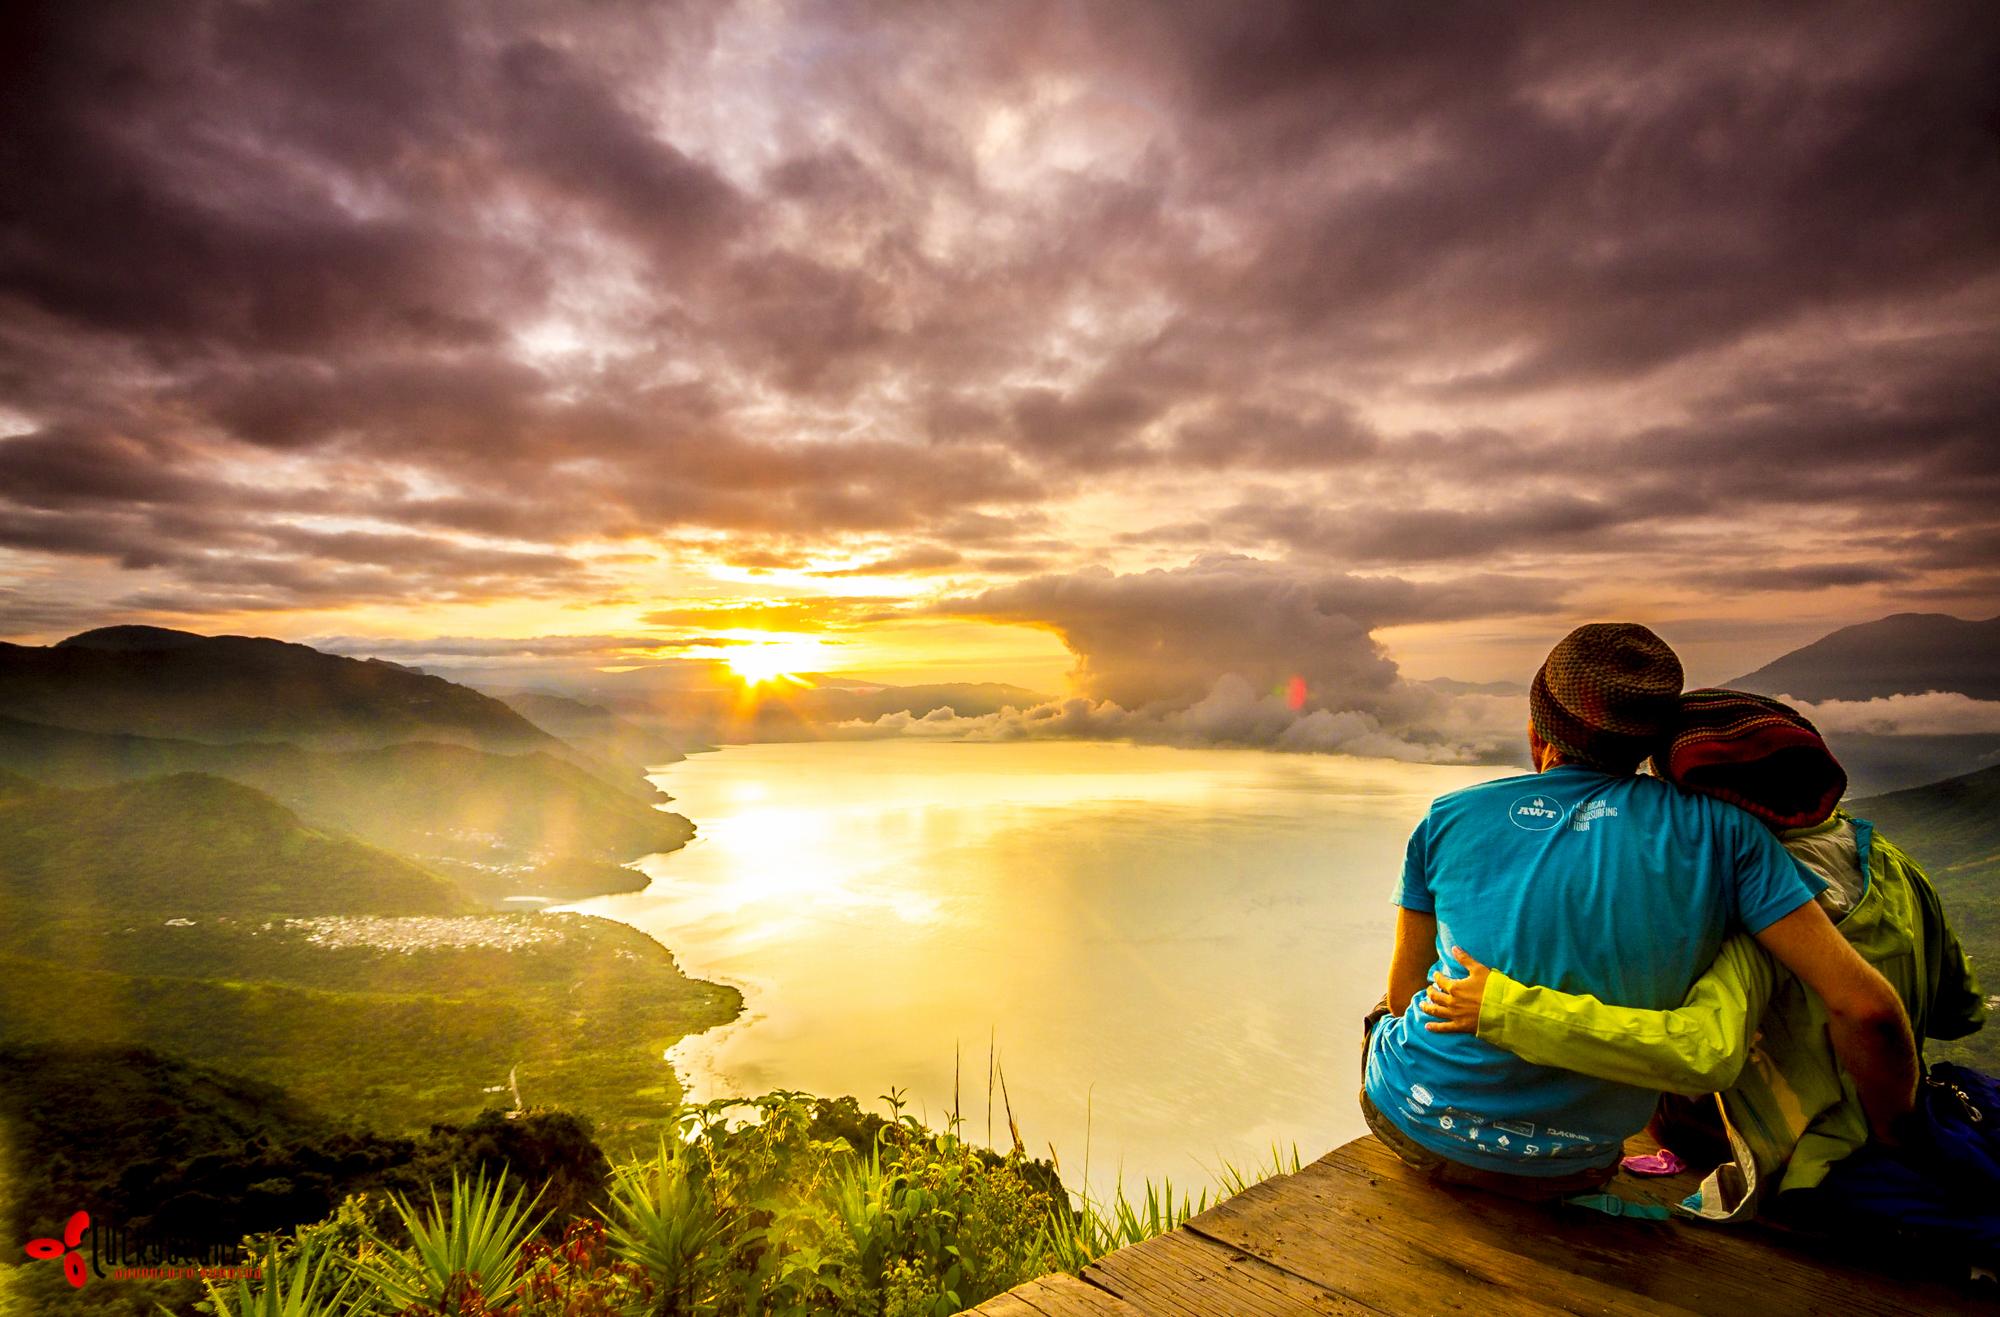 Sharing a splendid sunrise after a 3am rise.